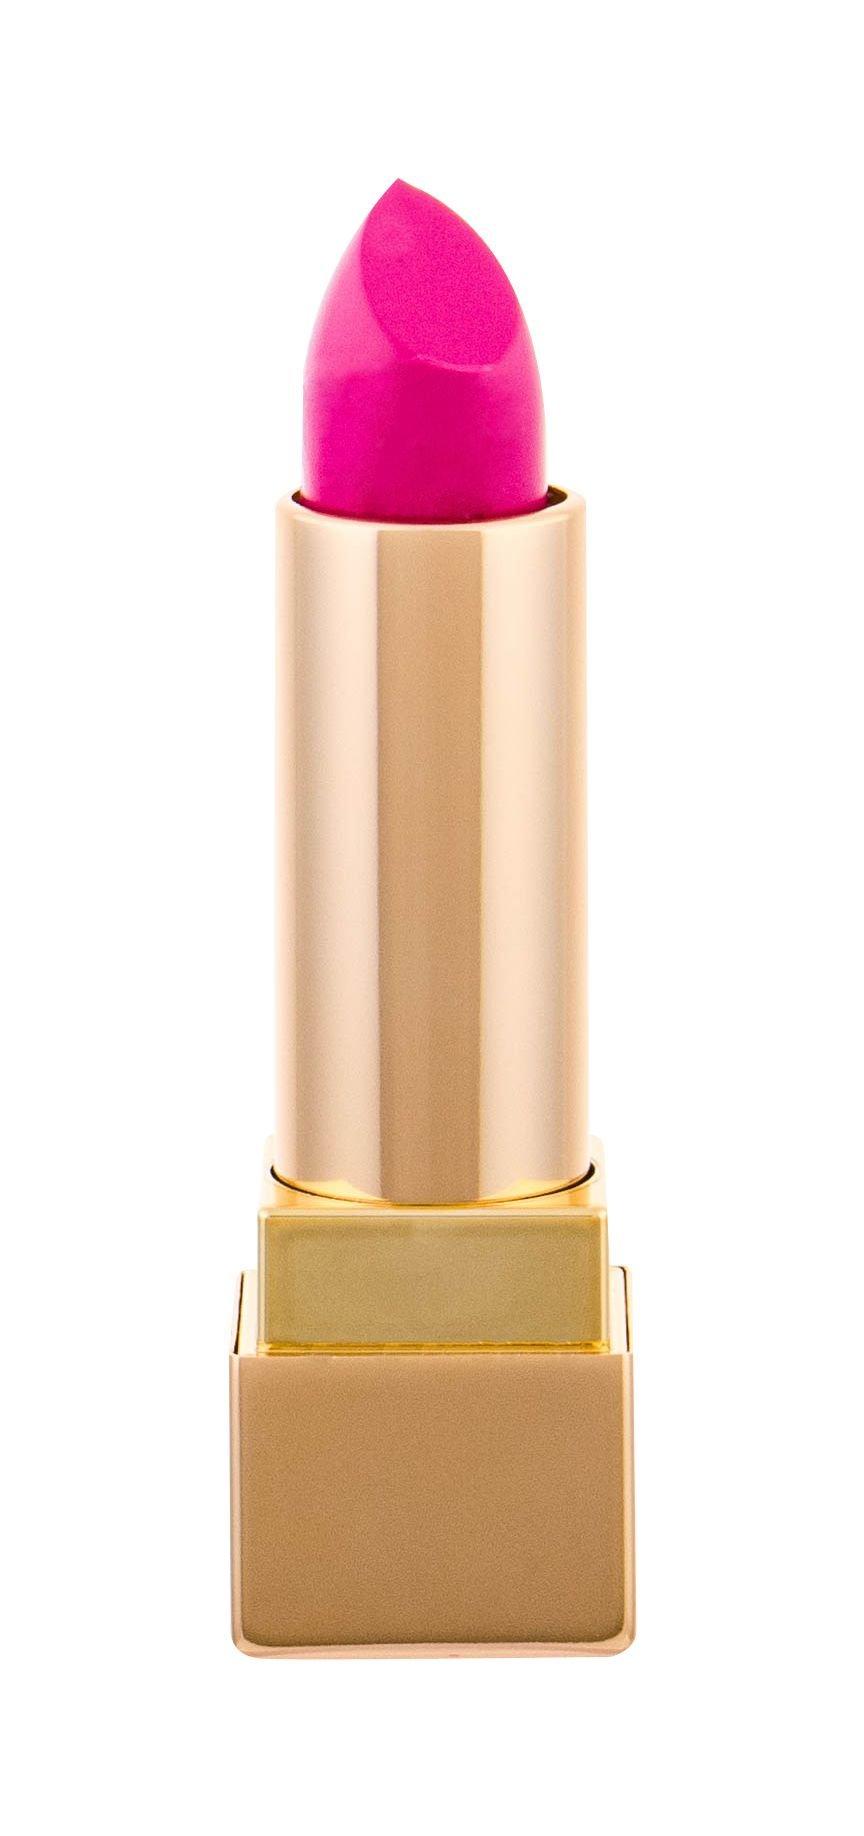 Yves Saint Laurent Rouge Pur Couture Lipstick 3,8ml 27 Fuchsia Innocent